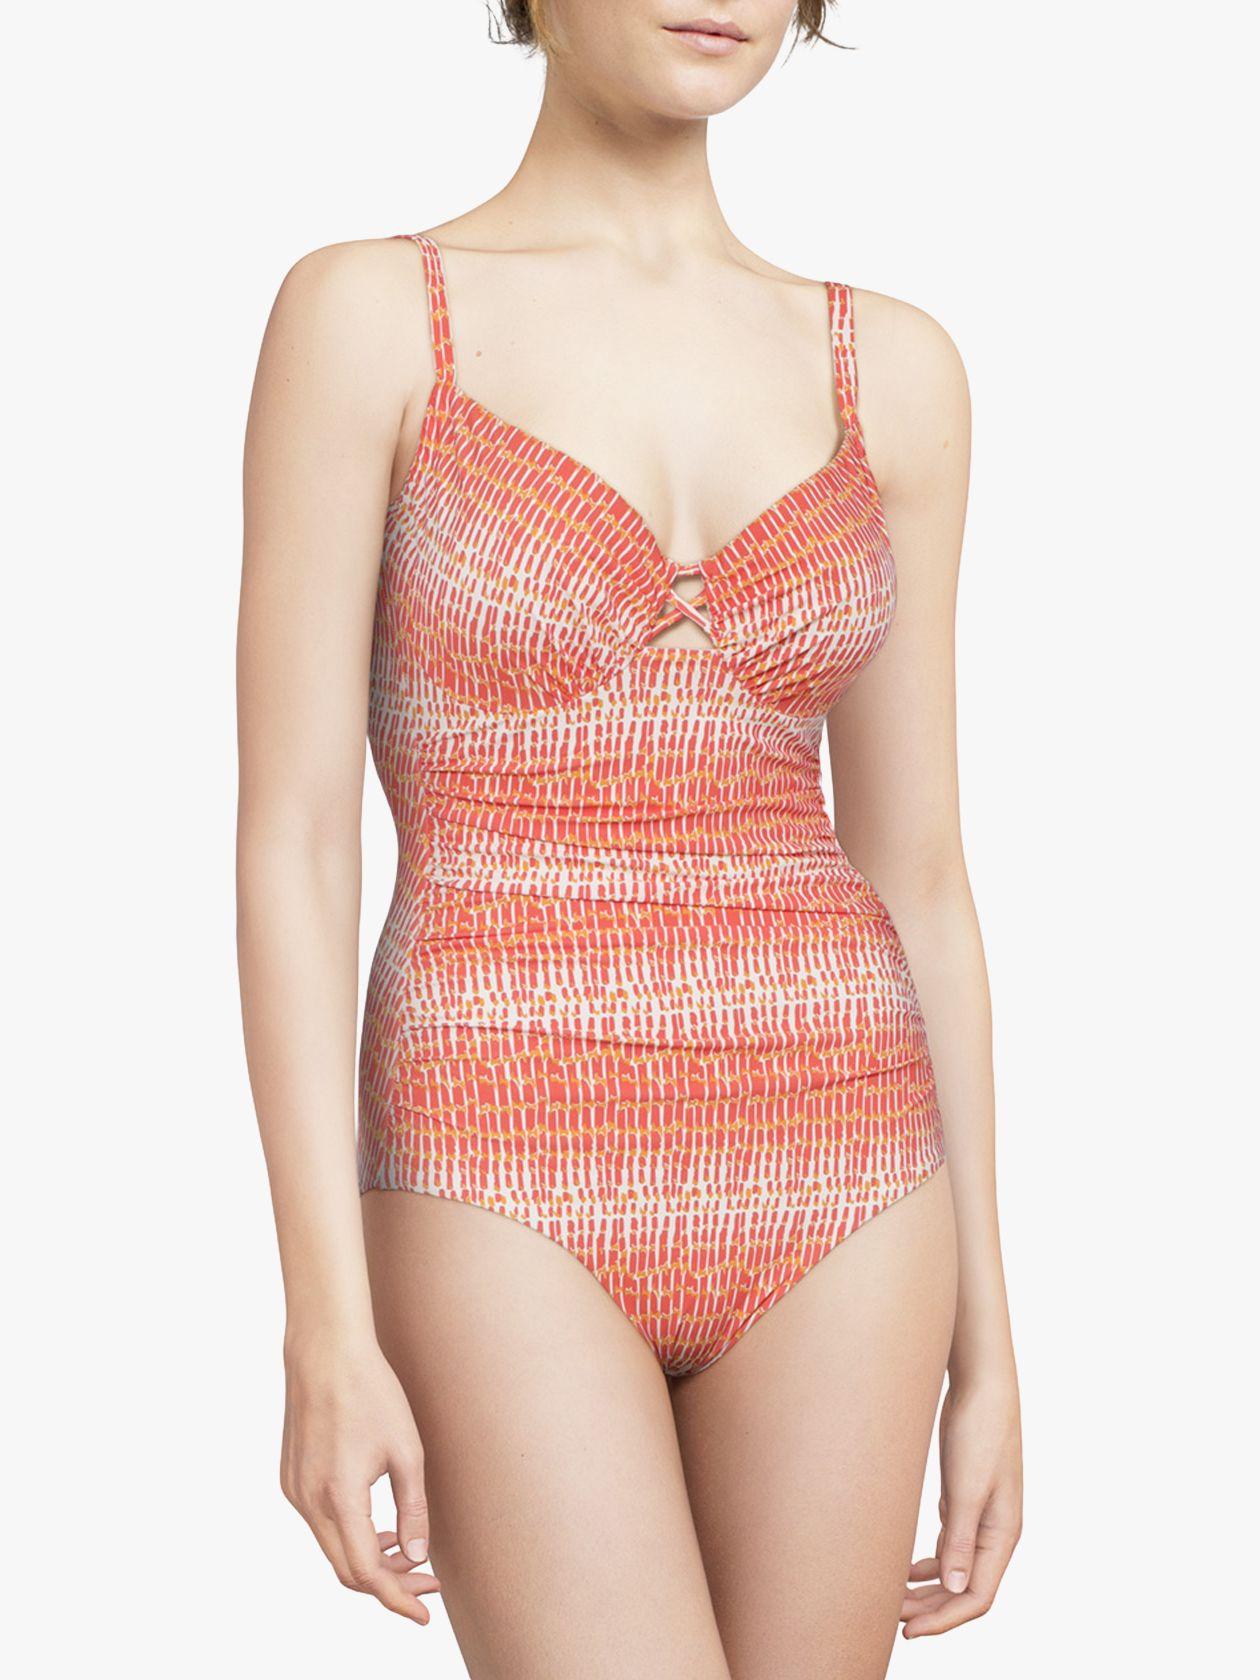 Chantelle Chantelle Shades Swimsuit